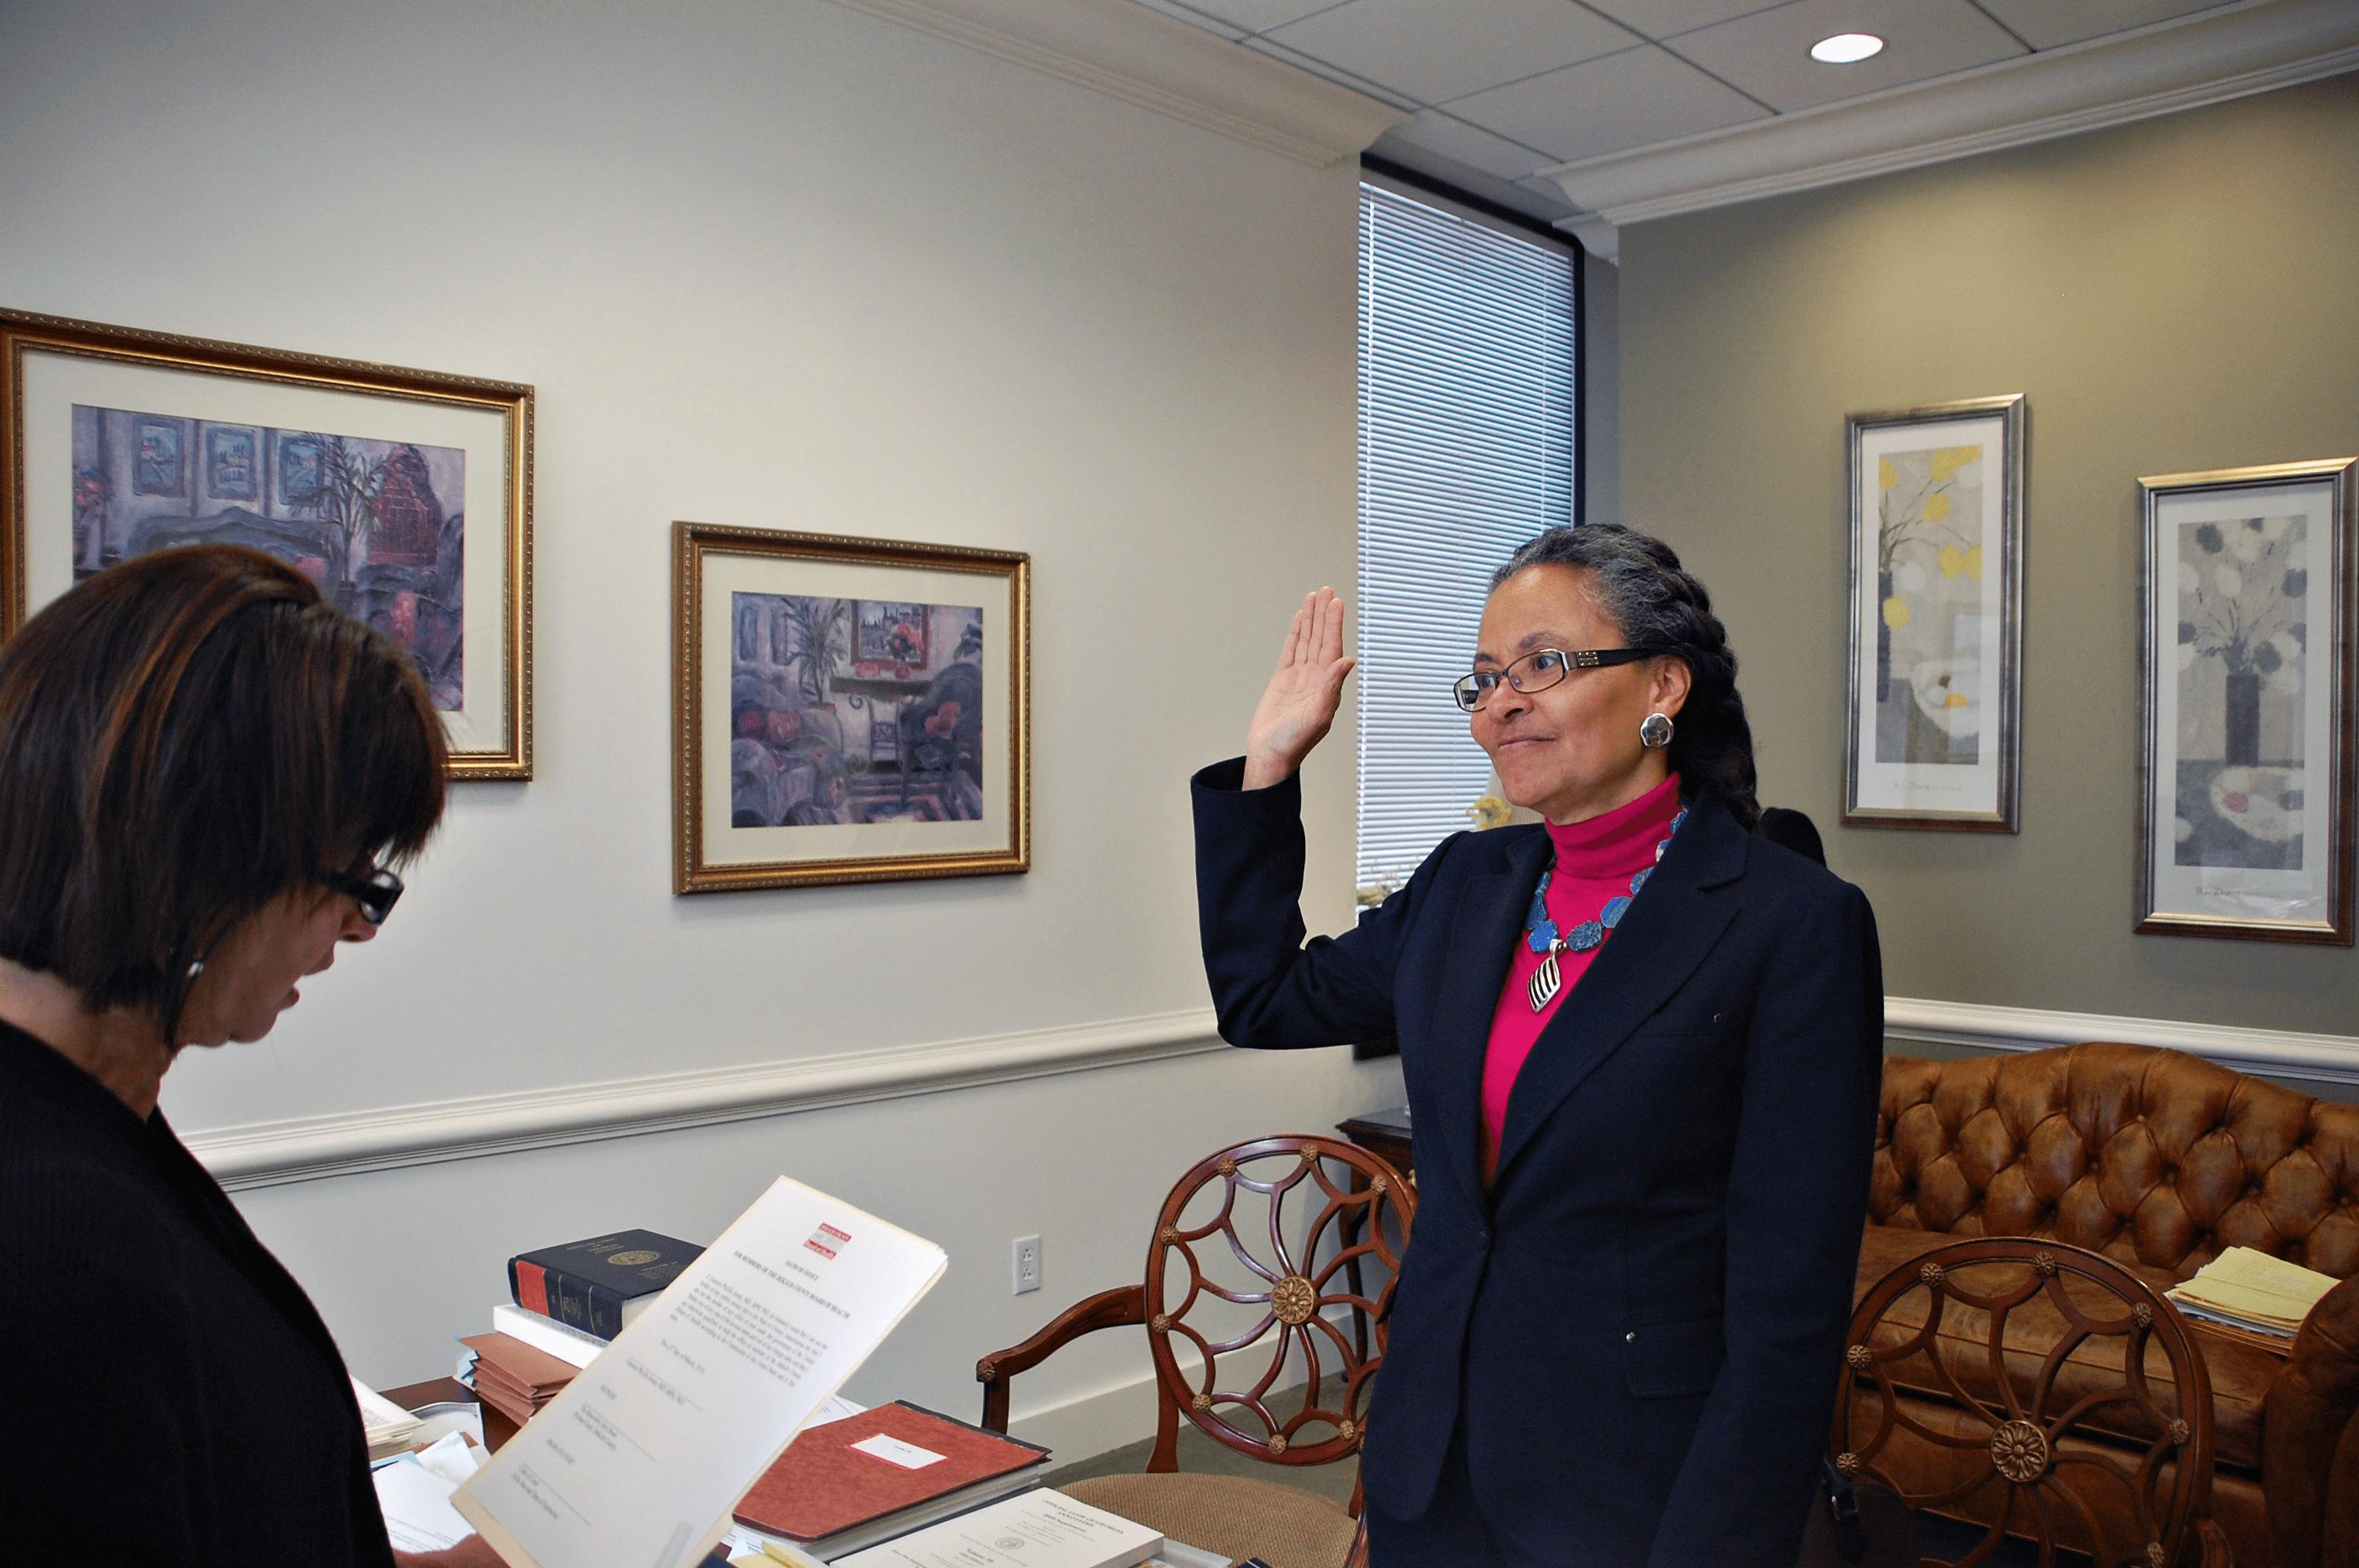 Dr. Camara Jones is sworn in as a member of the DeKalb County Board of Health.